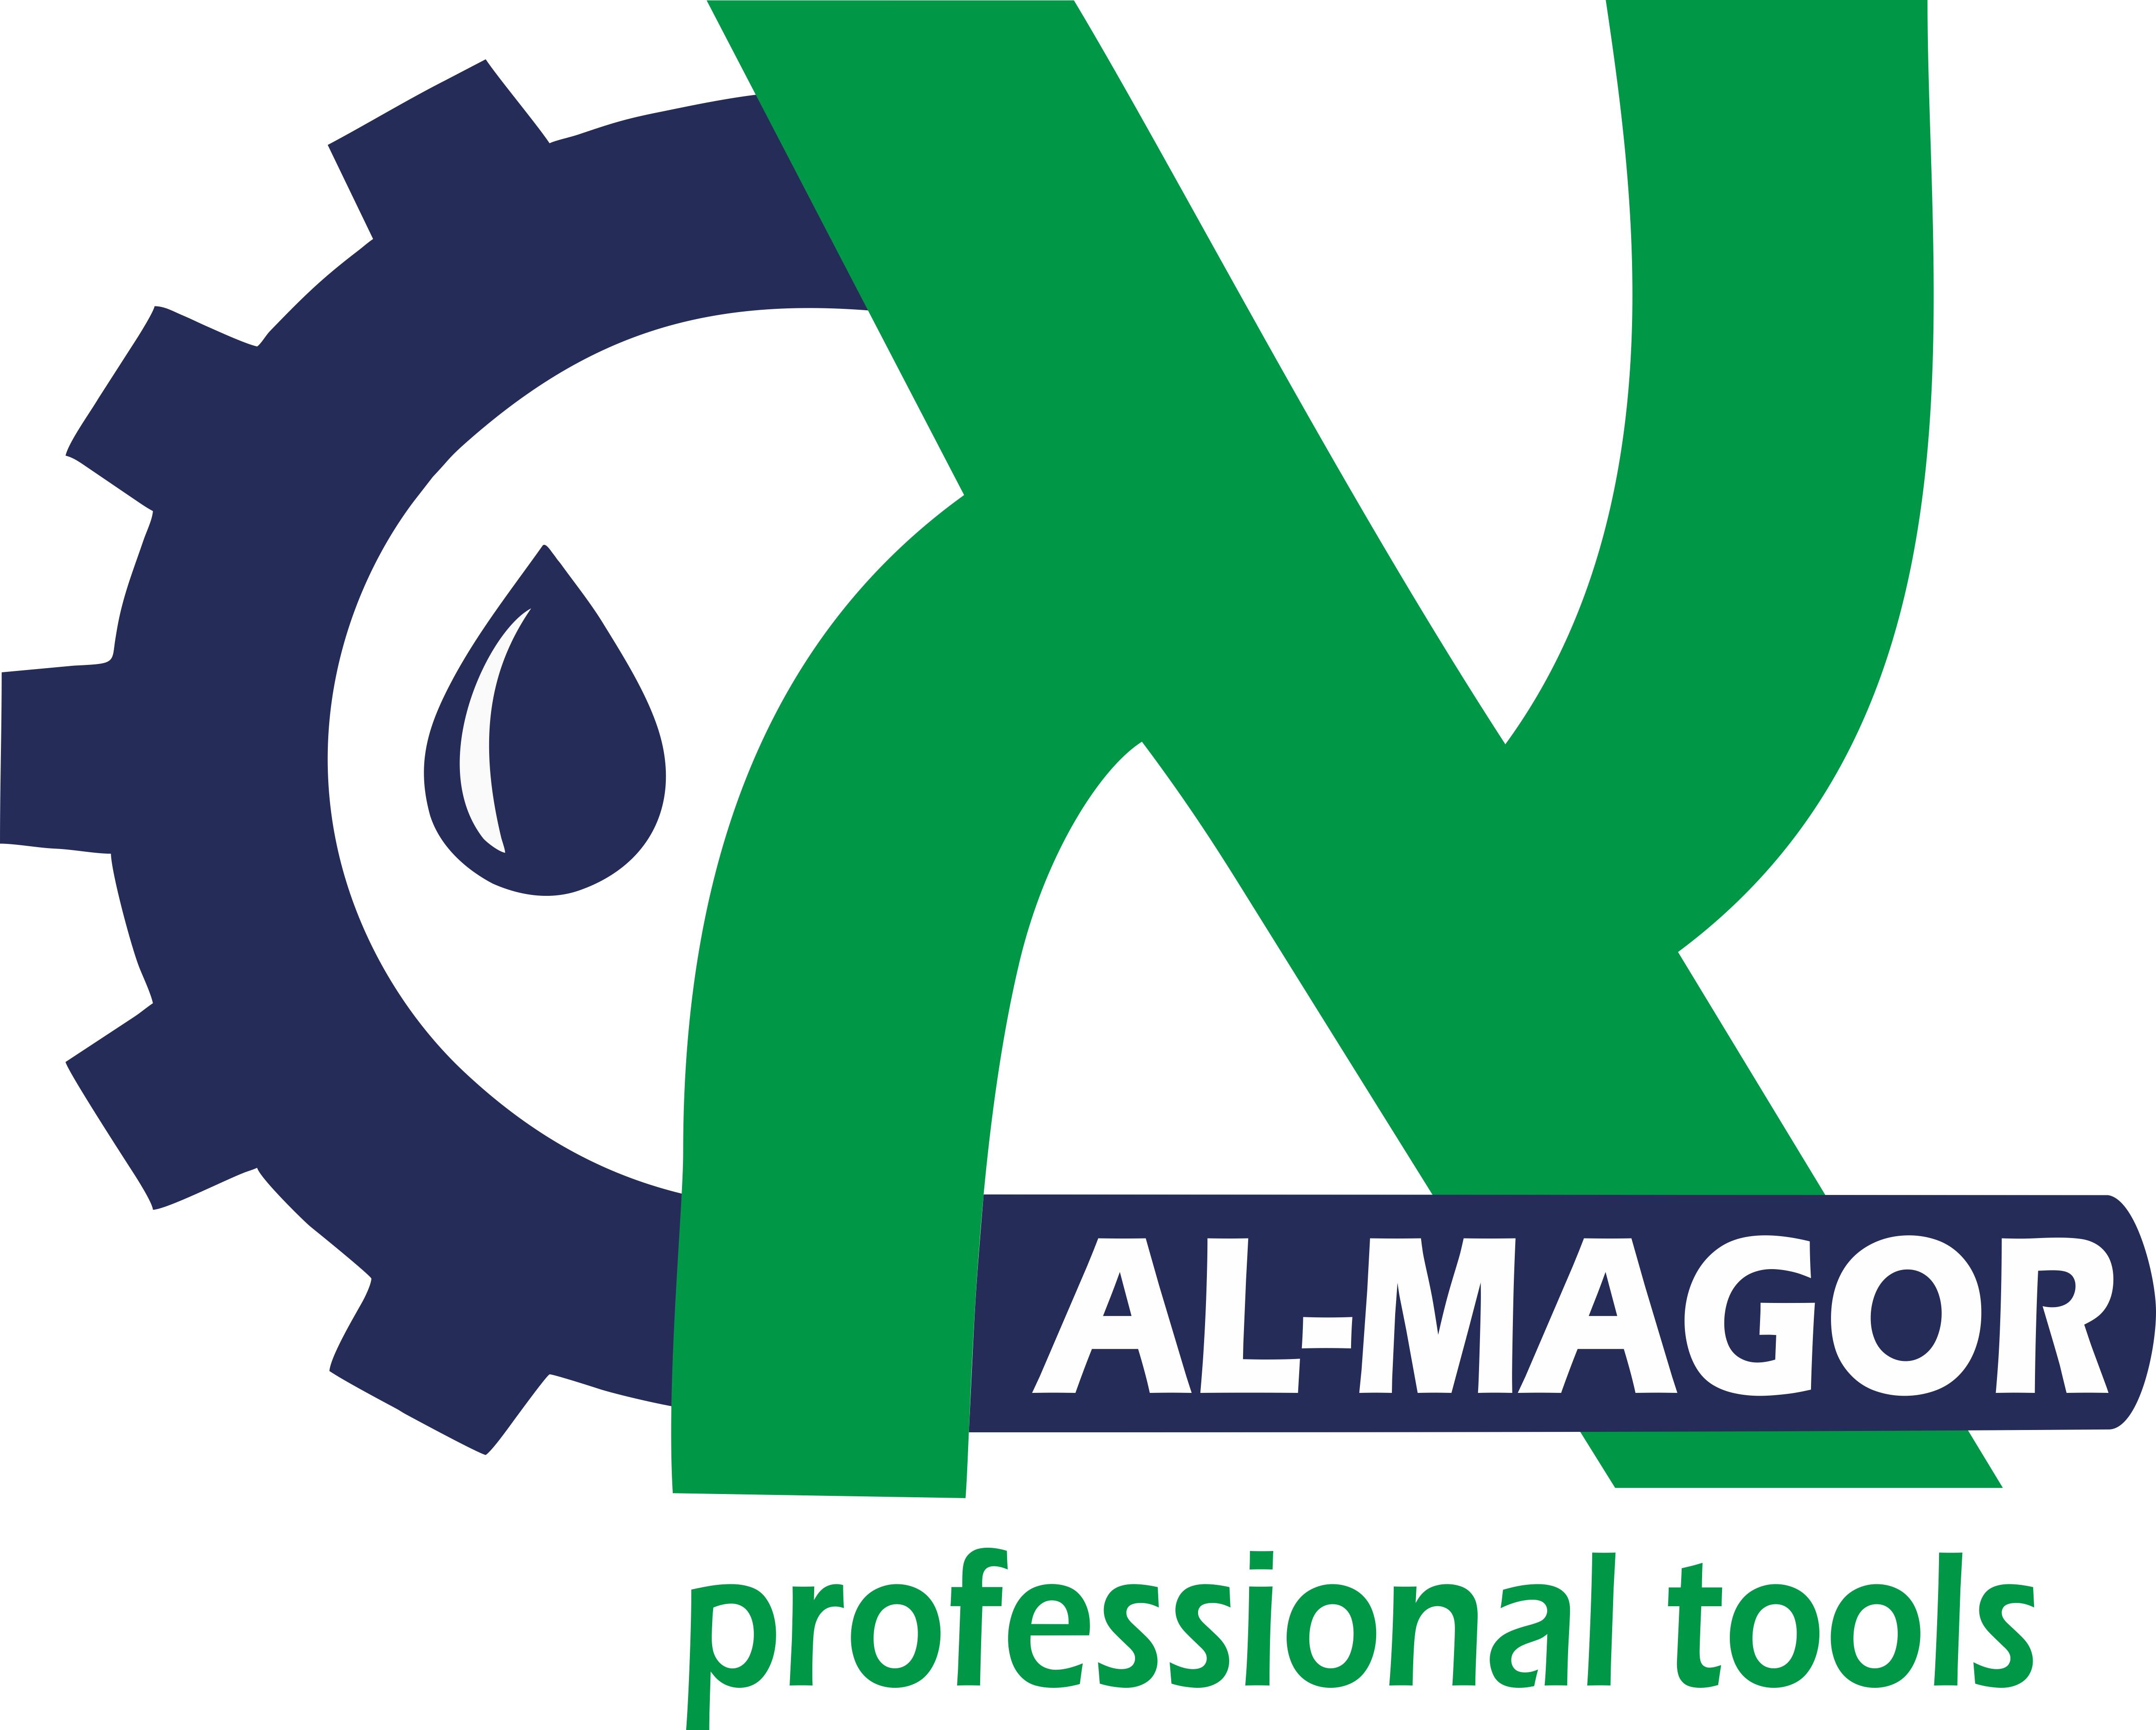 AL-MAGOR PLASTO MECHNICS